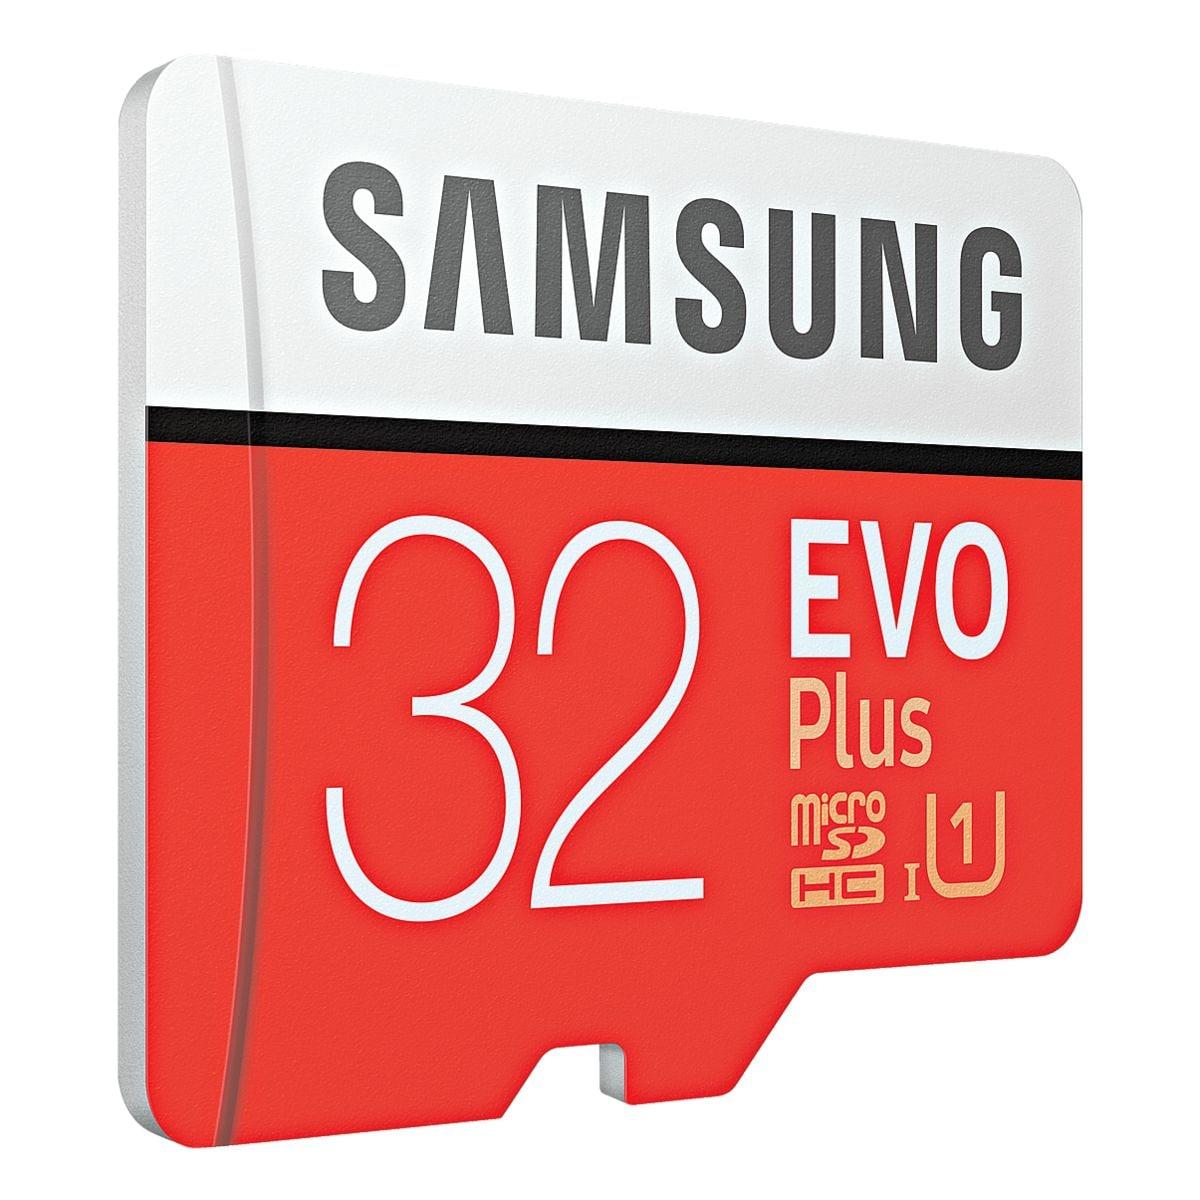 Samsung microSDXC-Speicherkarte »Evo Plus« 32 GB